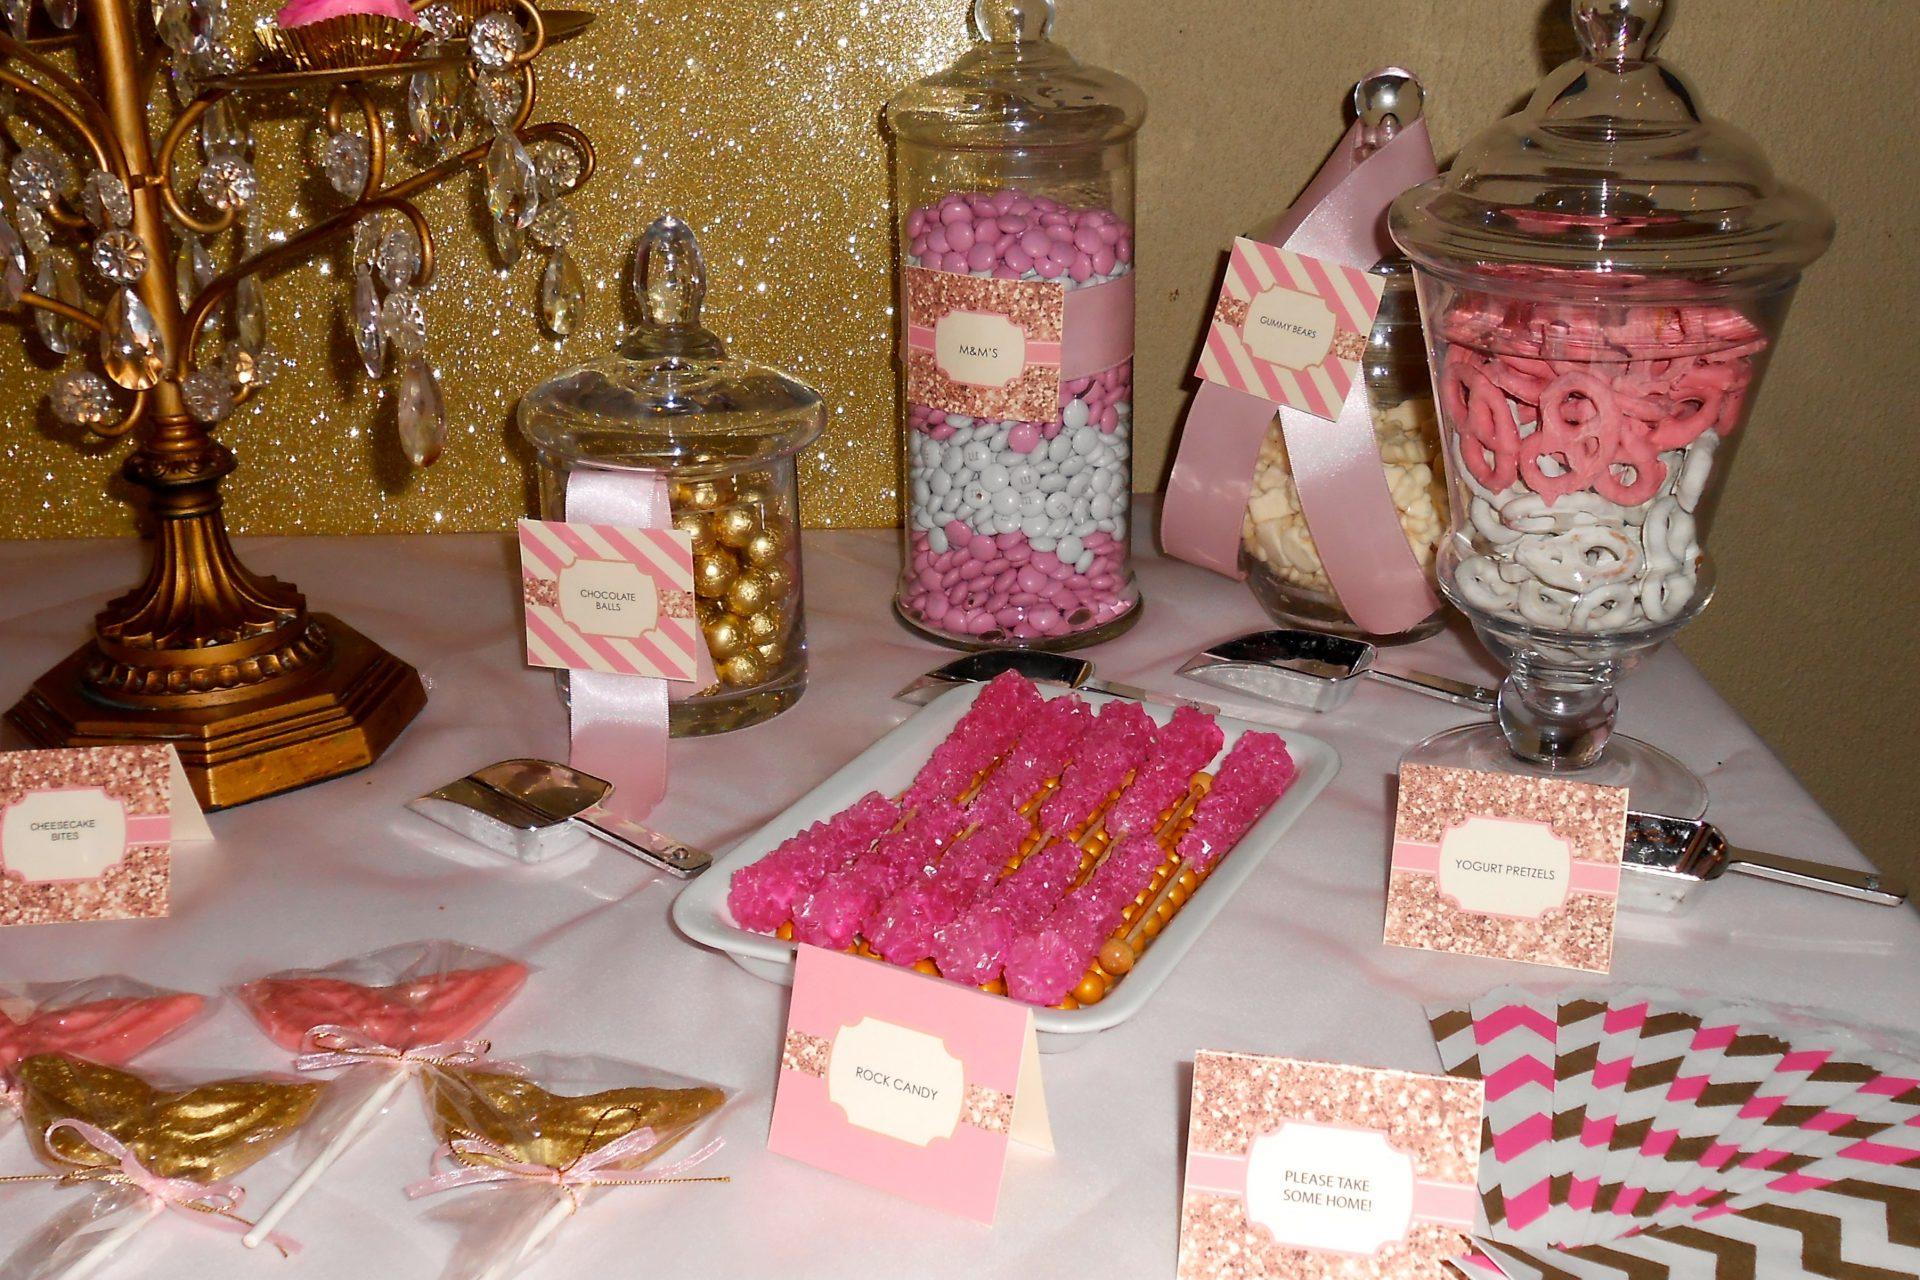 Pink and White Dessert Bar